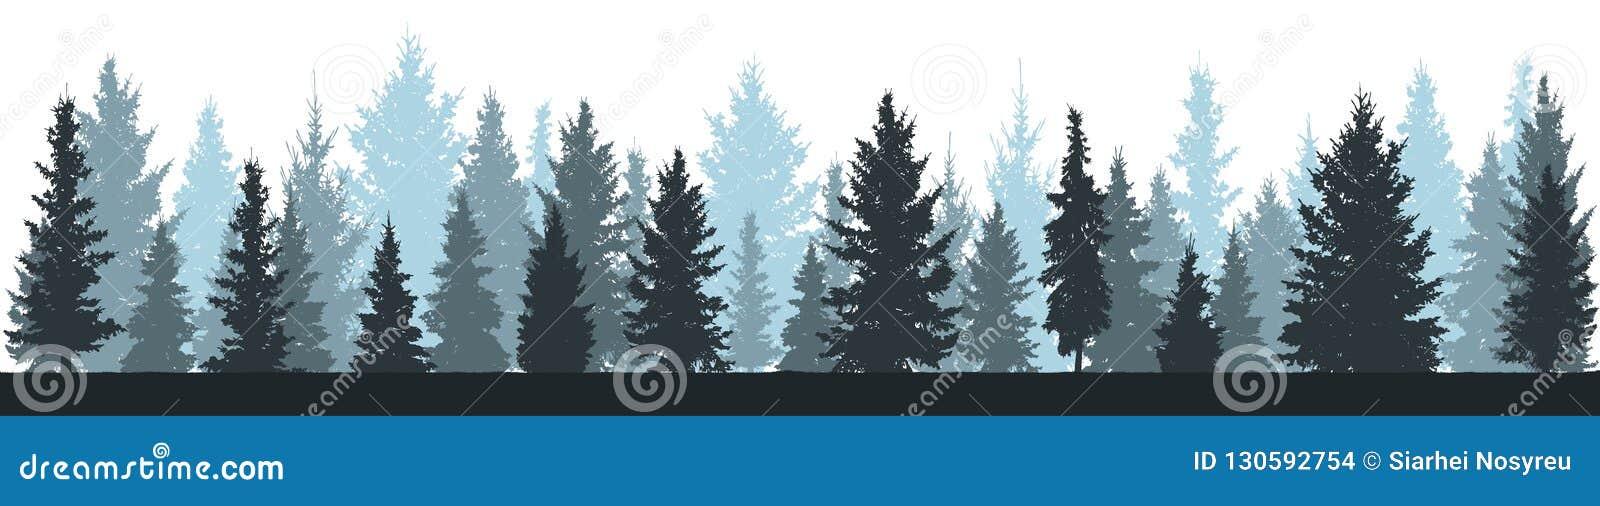 De winter bossparren, net silhouet op witte achtergrond